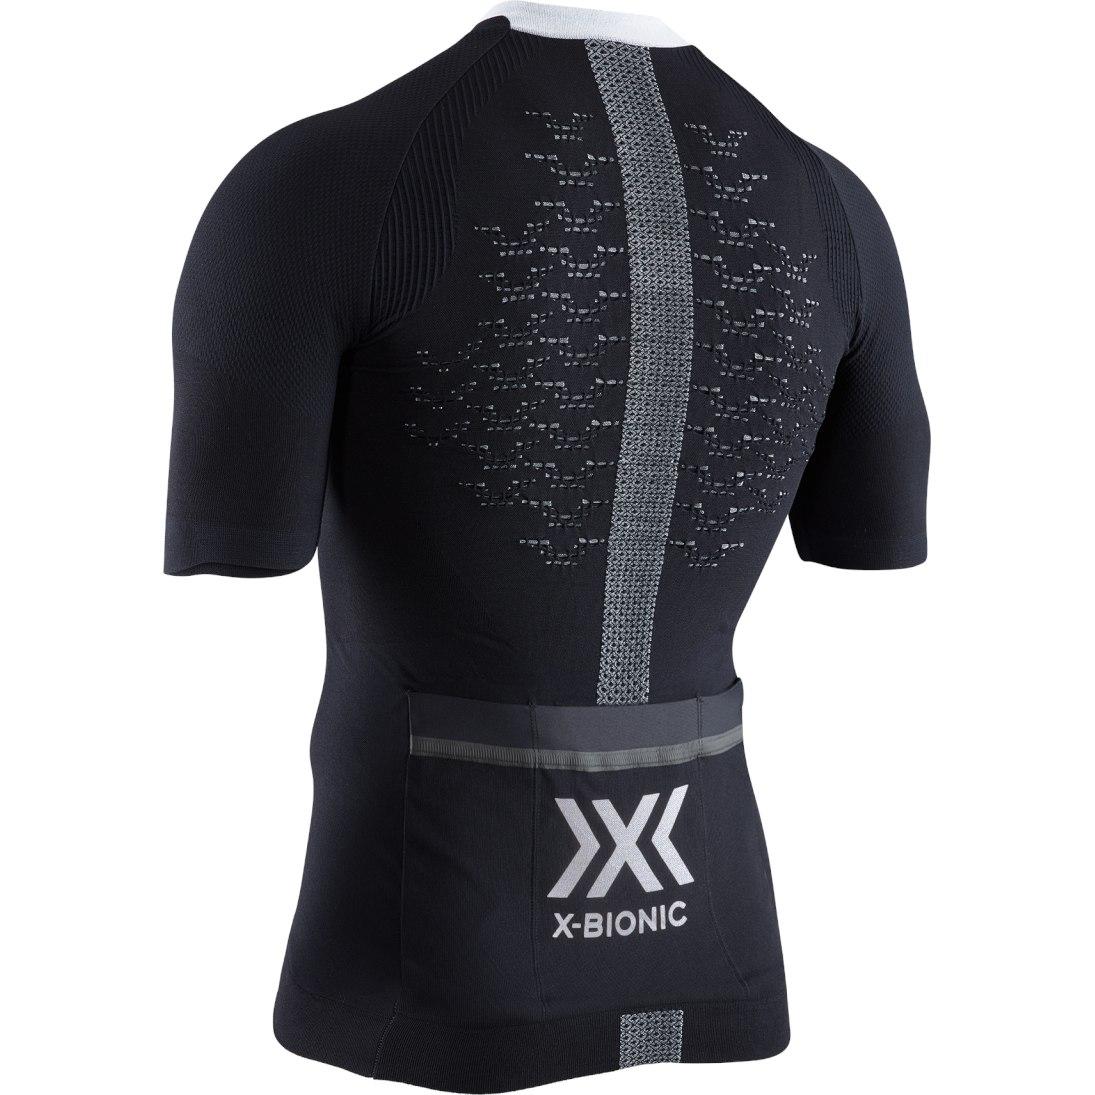 Image of X-Bionic The Trick 4.0 Bike Full Zip Shirt Short Sleeves for Men - opal black/arctic white